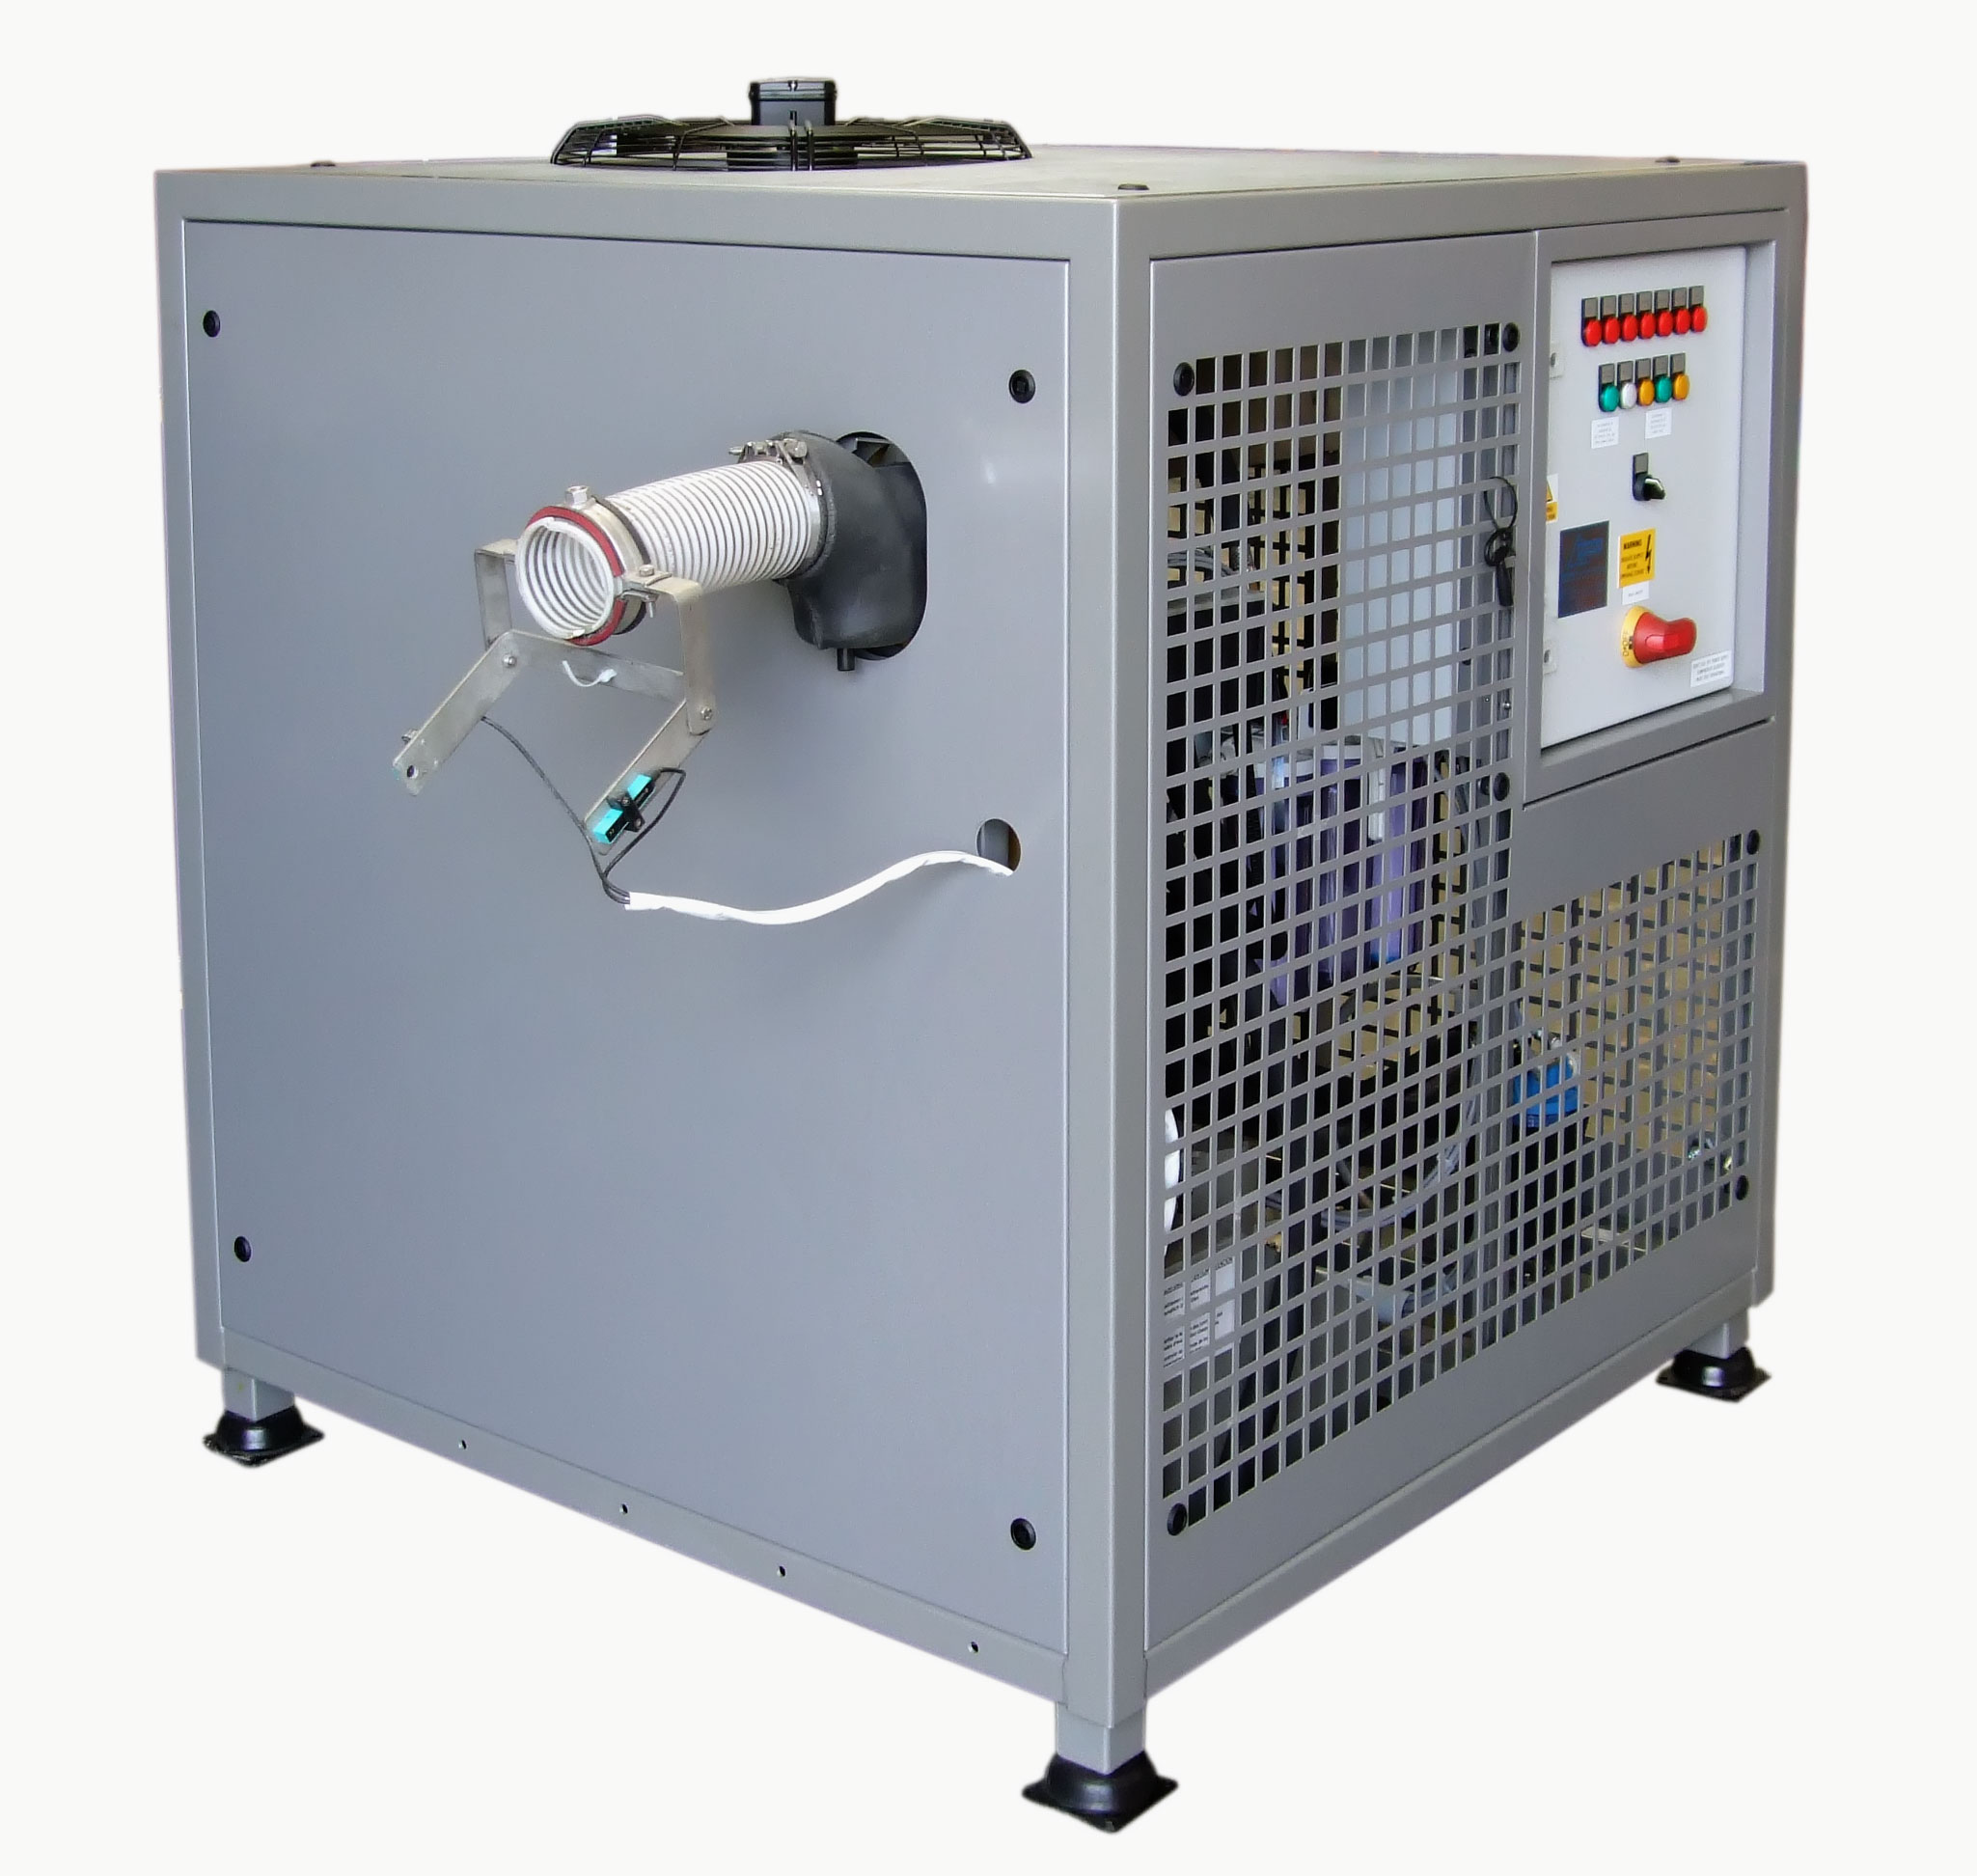 rent an icee machine